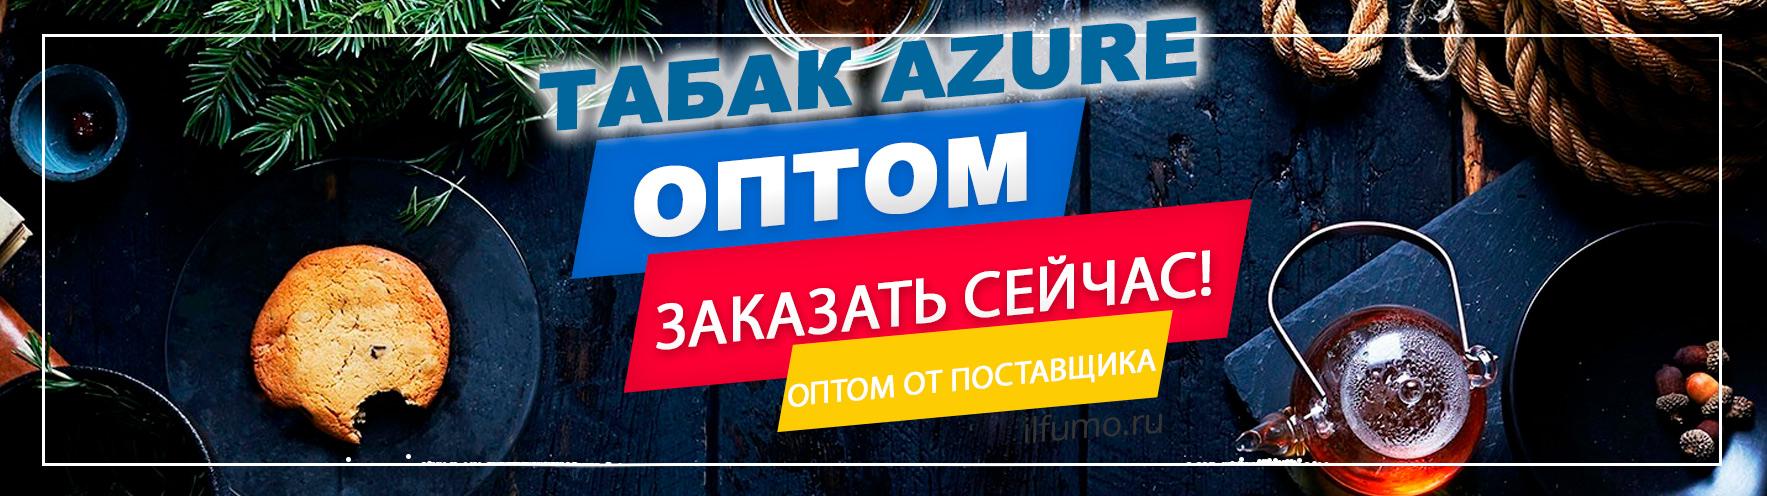 tabak dlja kaljana azure - Табак для кальяна Azure